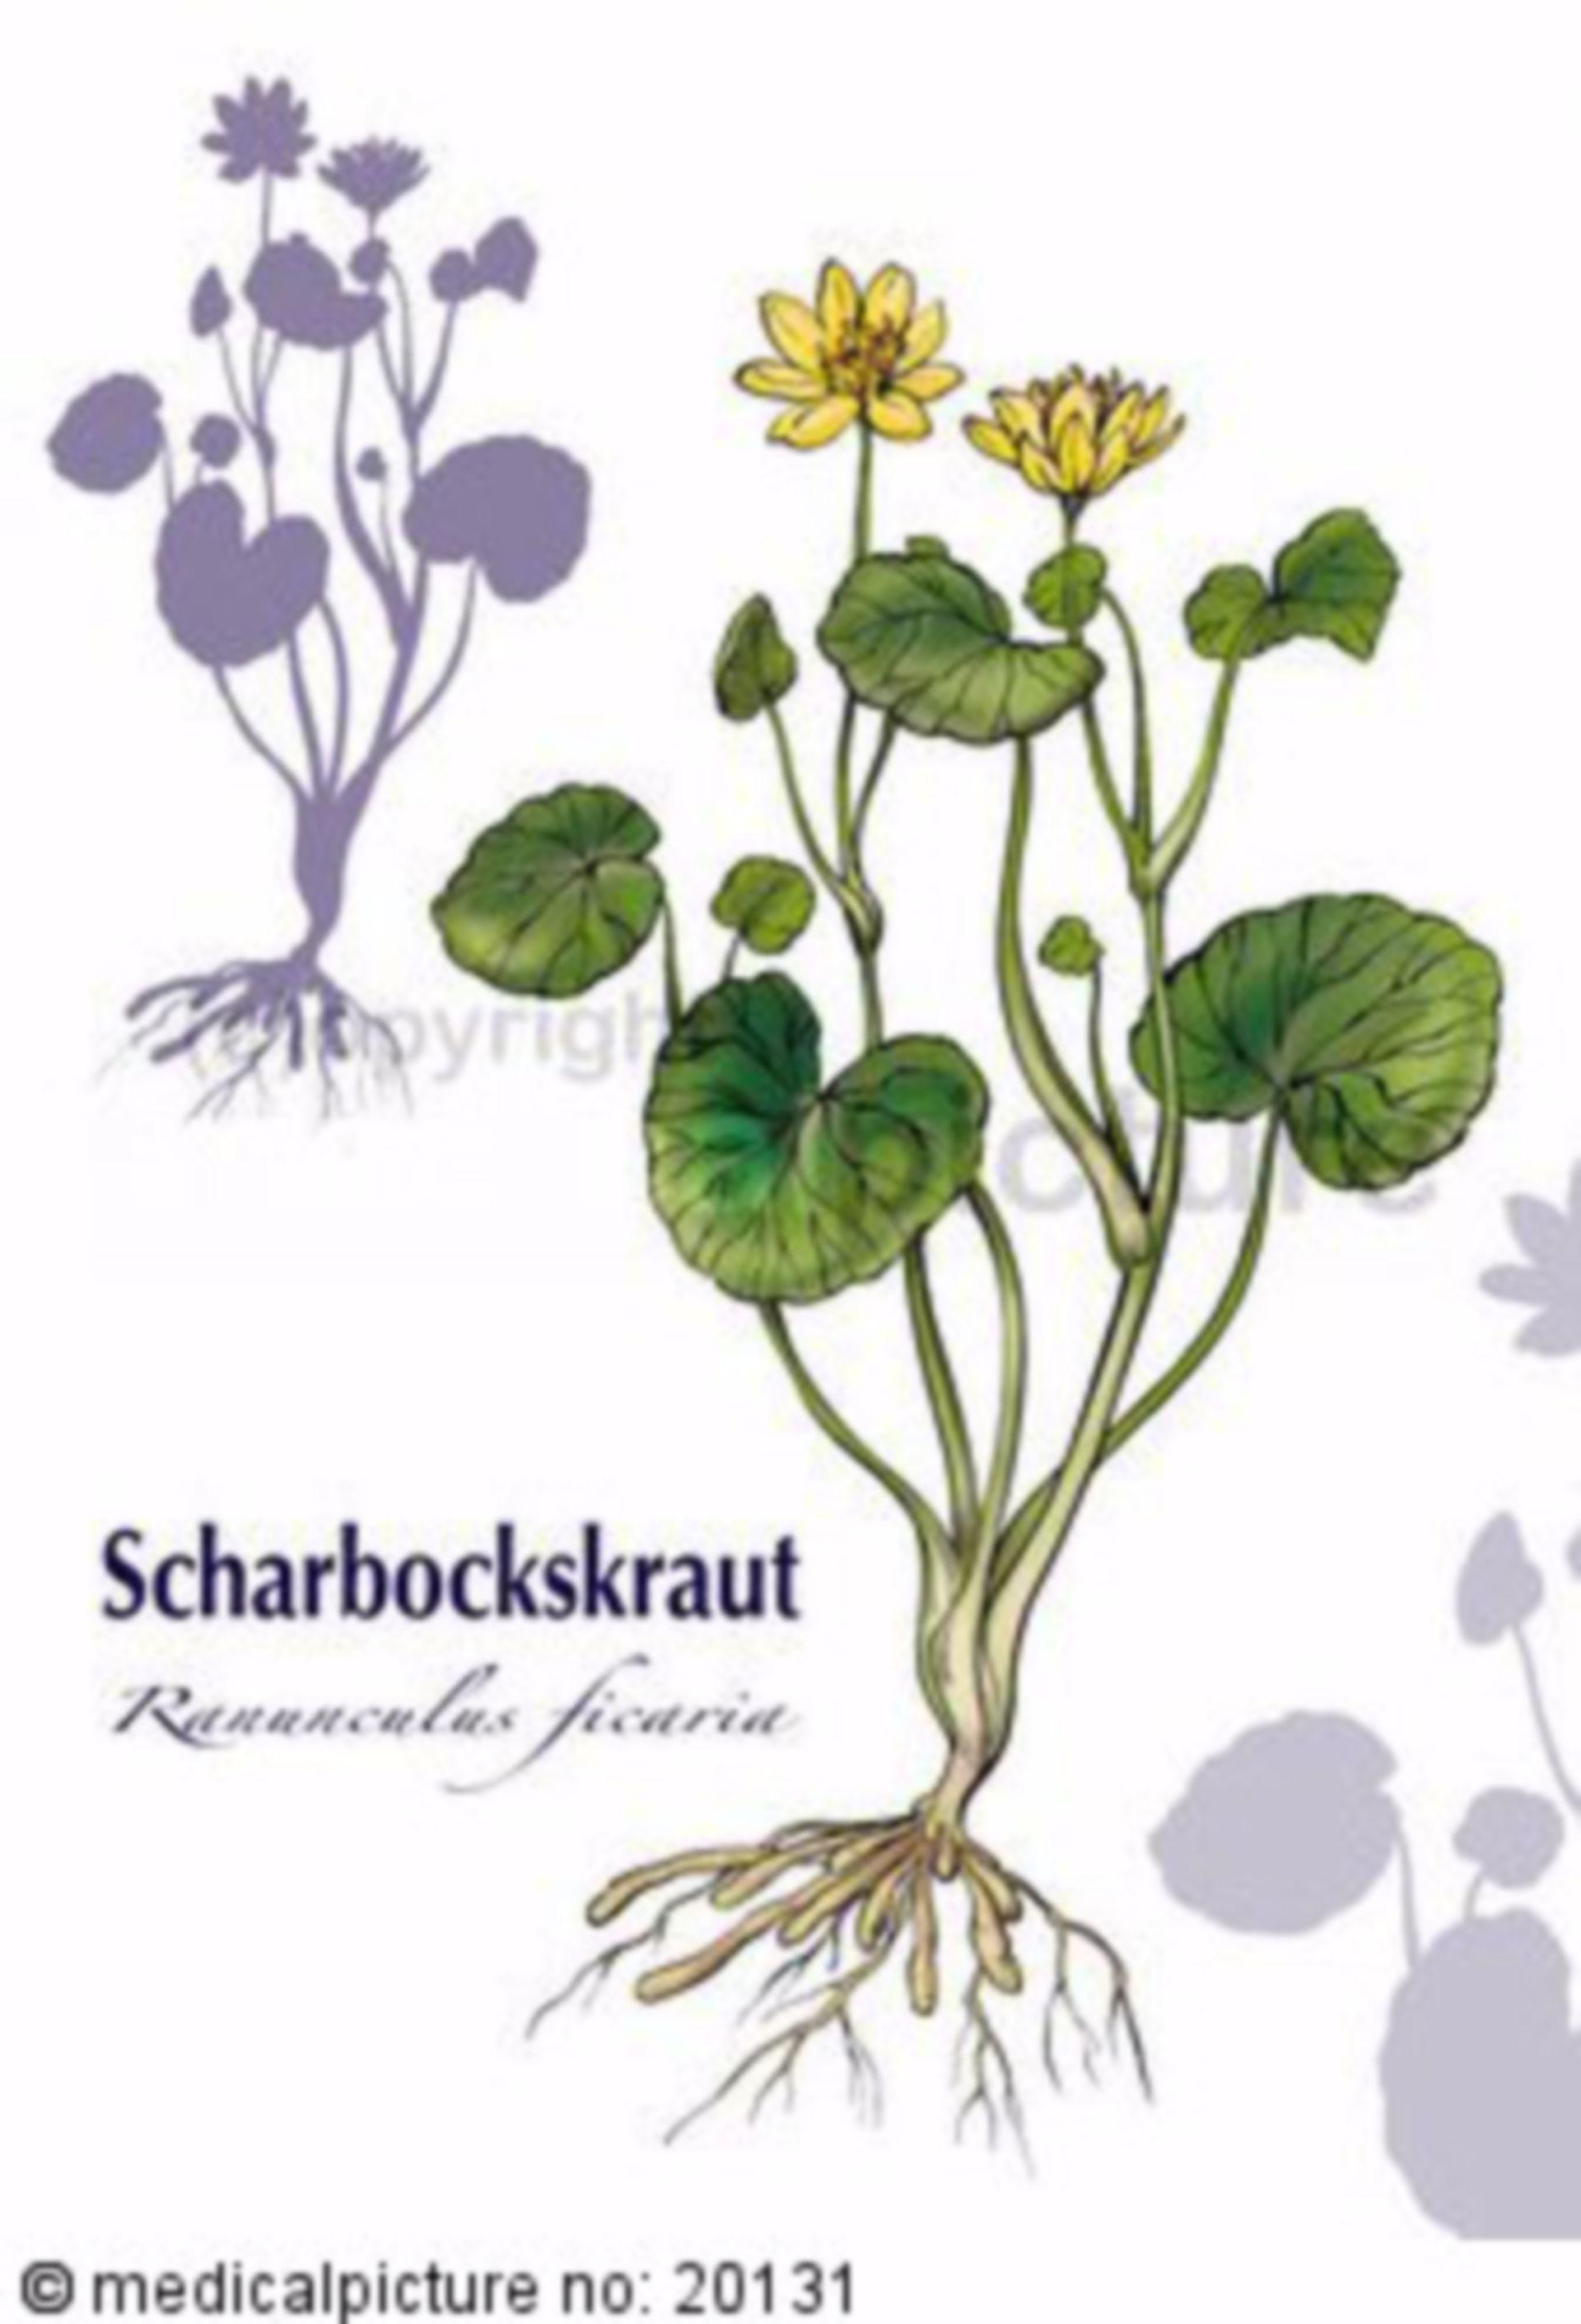 Scharbockskraut, Ranunculus ficaria